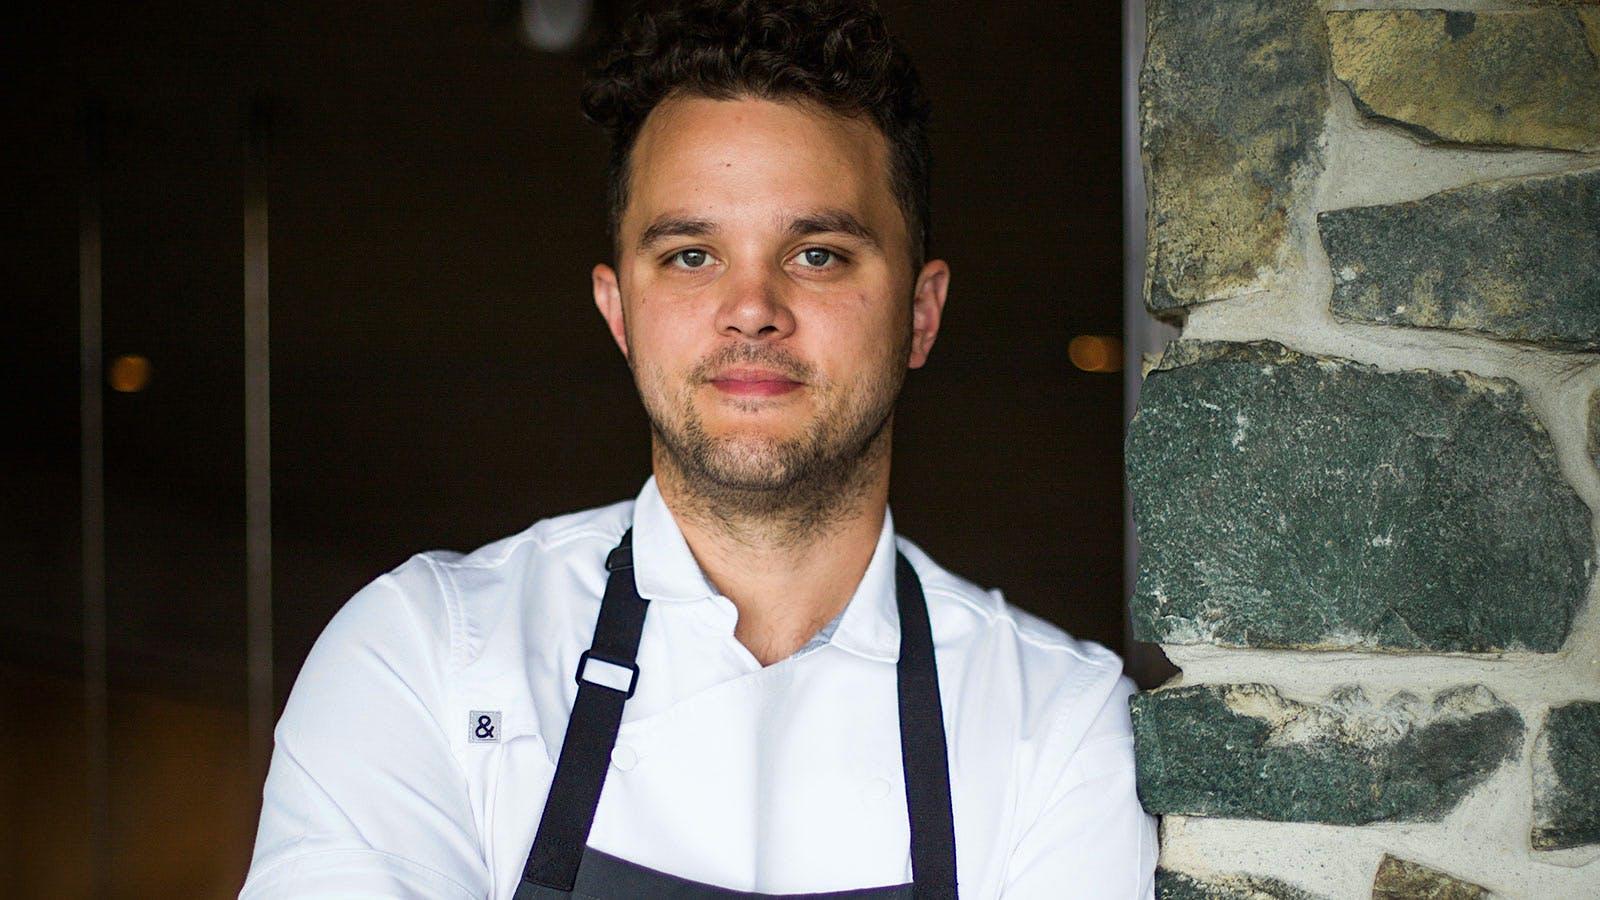 Chef Departs Grand Award Winner Canlis for New Venture